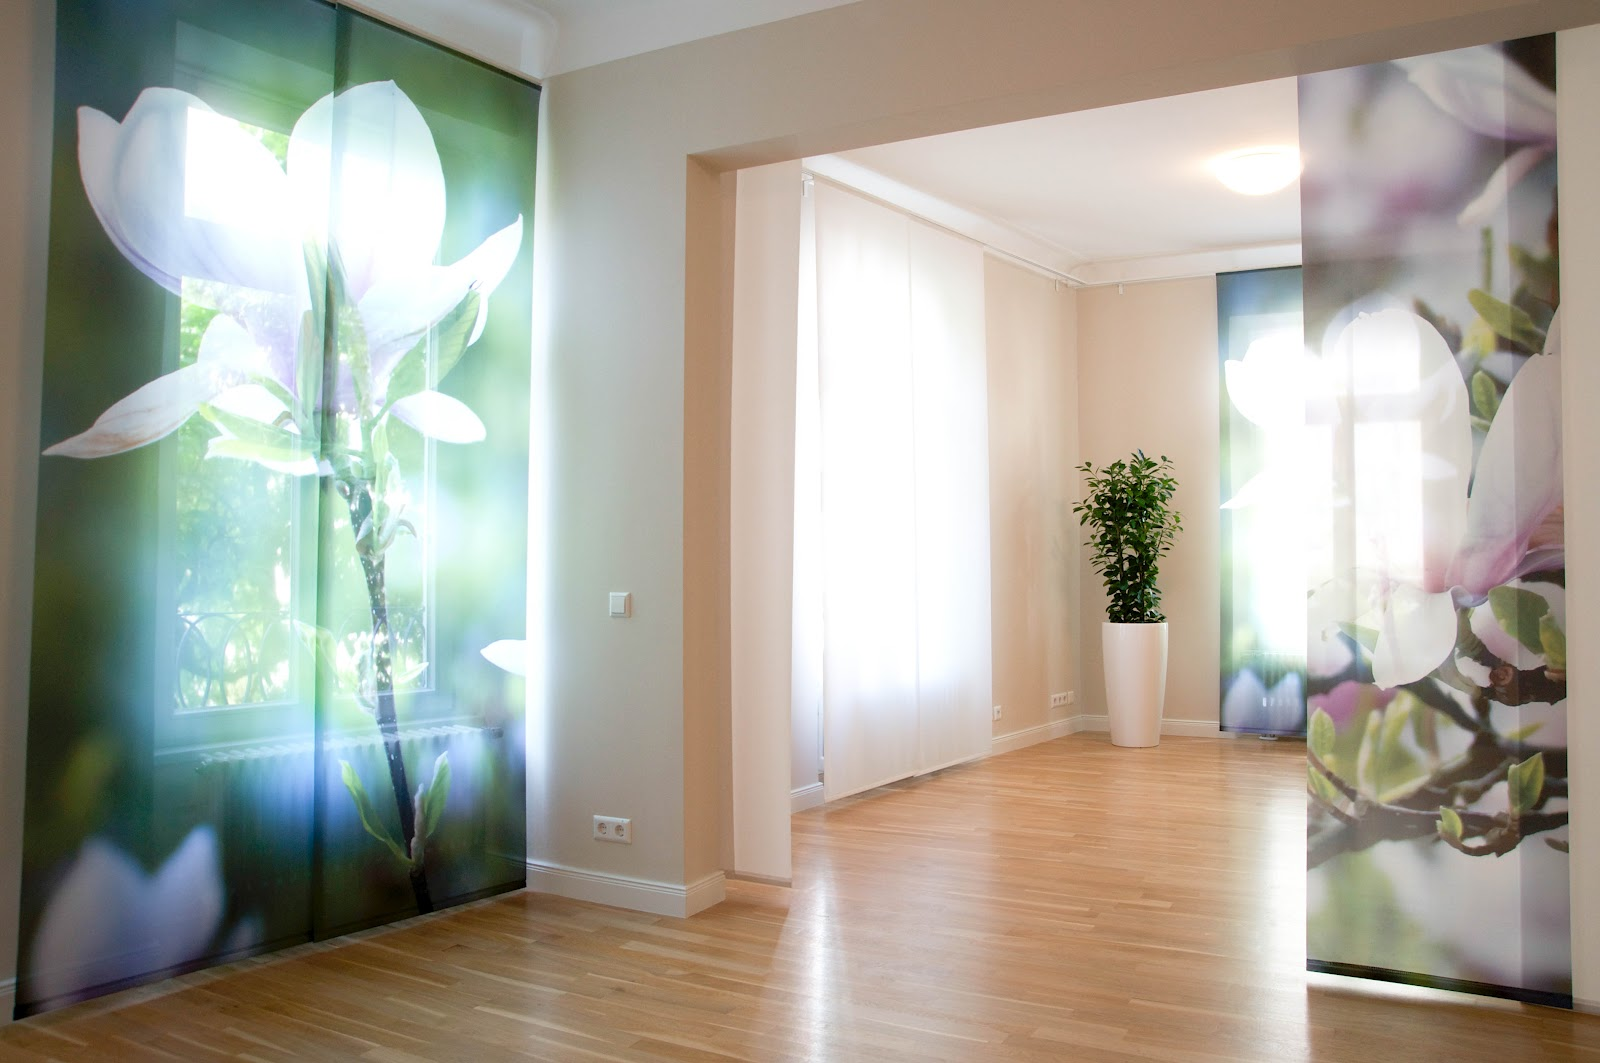 business feng shui by apprico therapiezentrum cge in baden baden umbau nach business feng. Black Bedroom Furniture Sets. Home Design Ideas